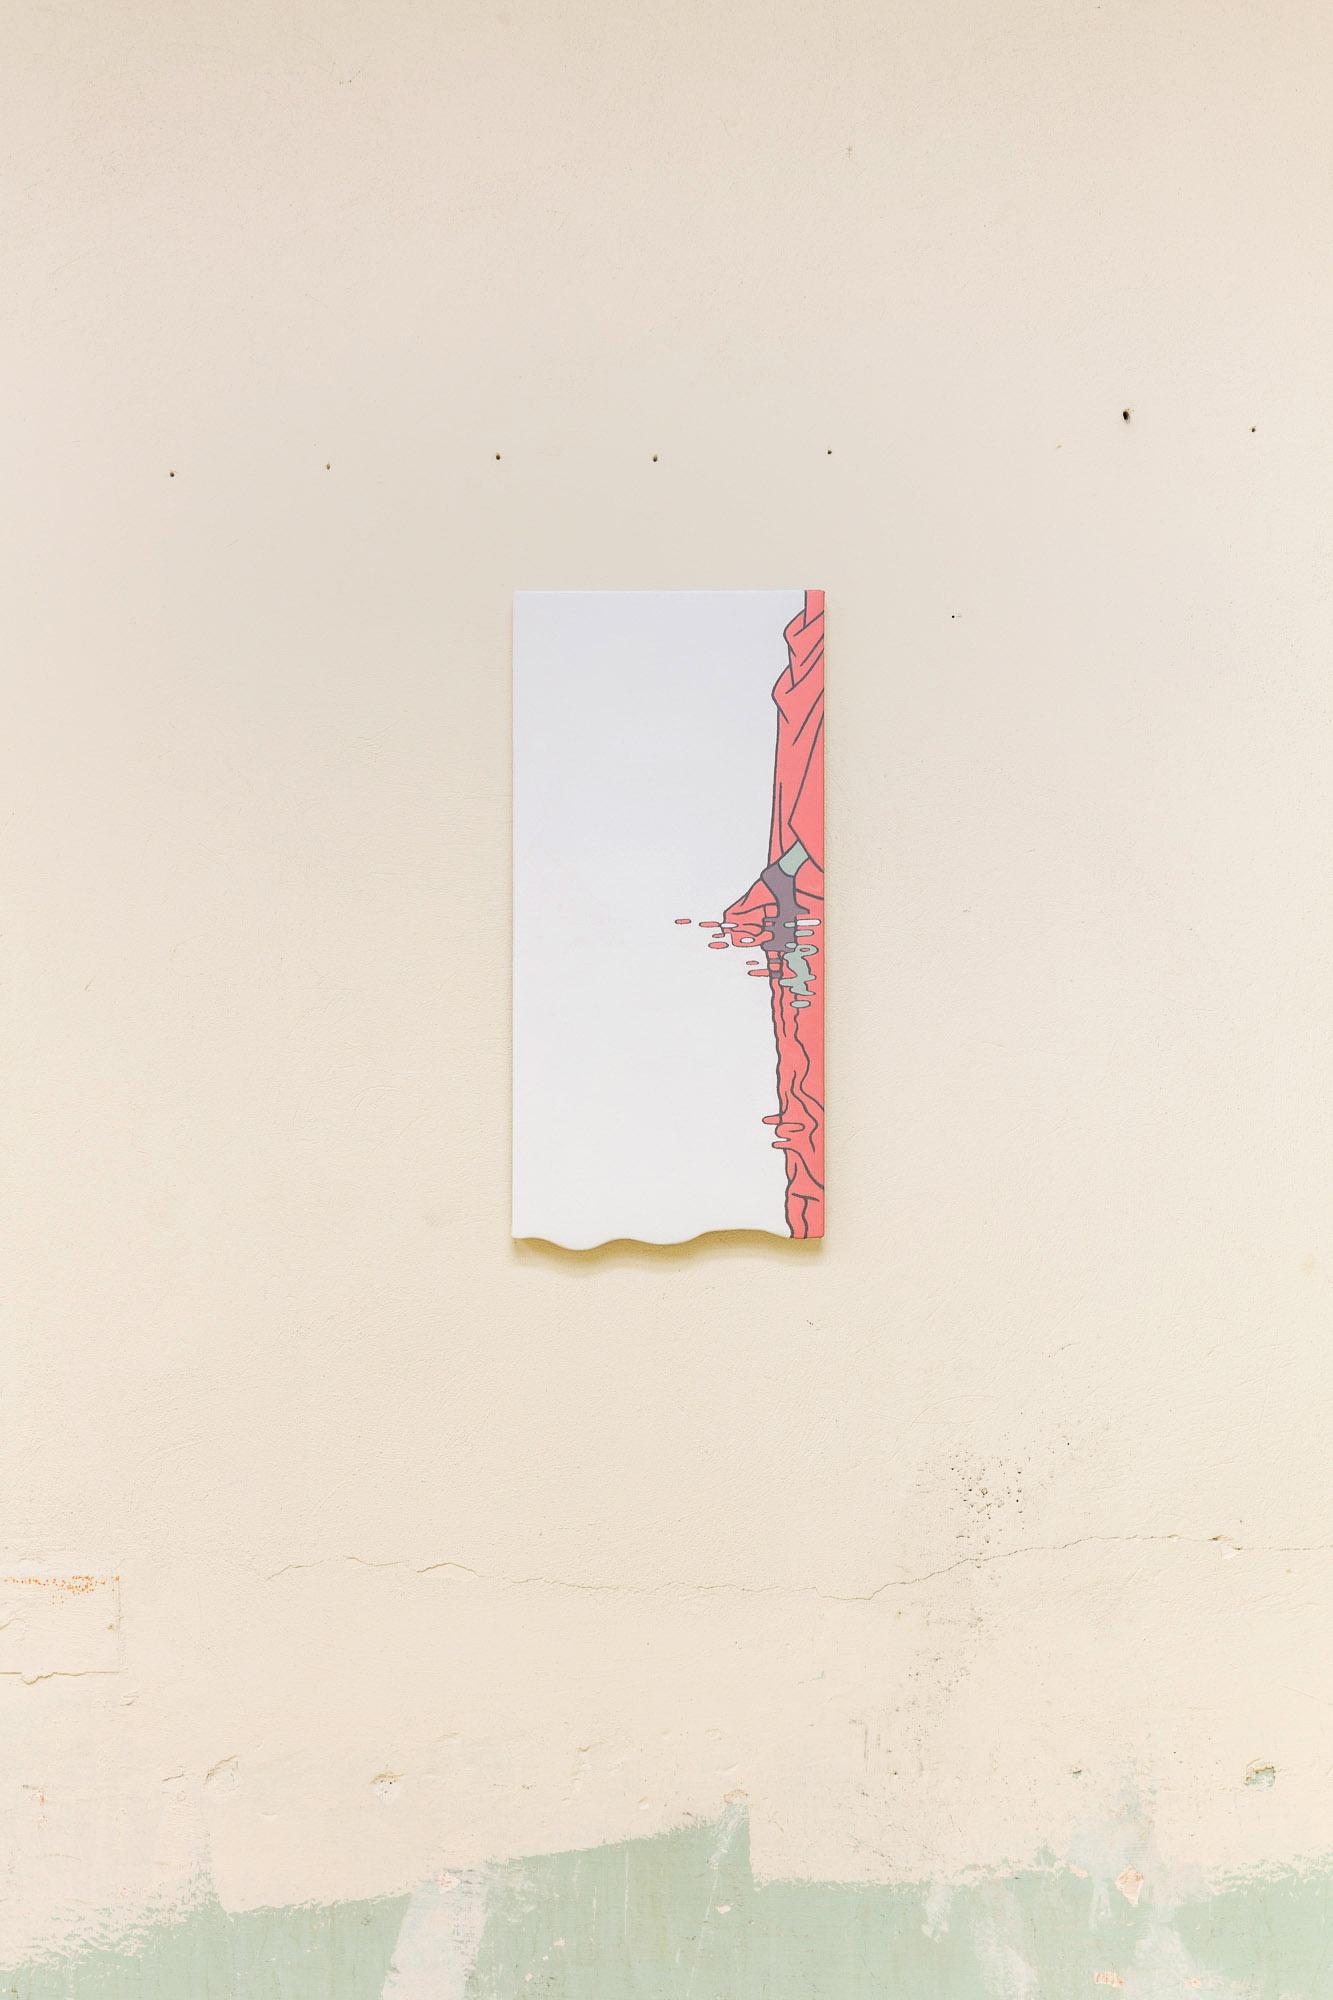 drawing, installation, sculpture, installation, contemporary art